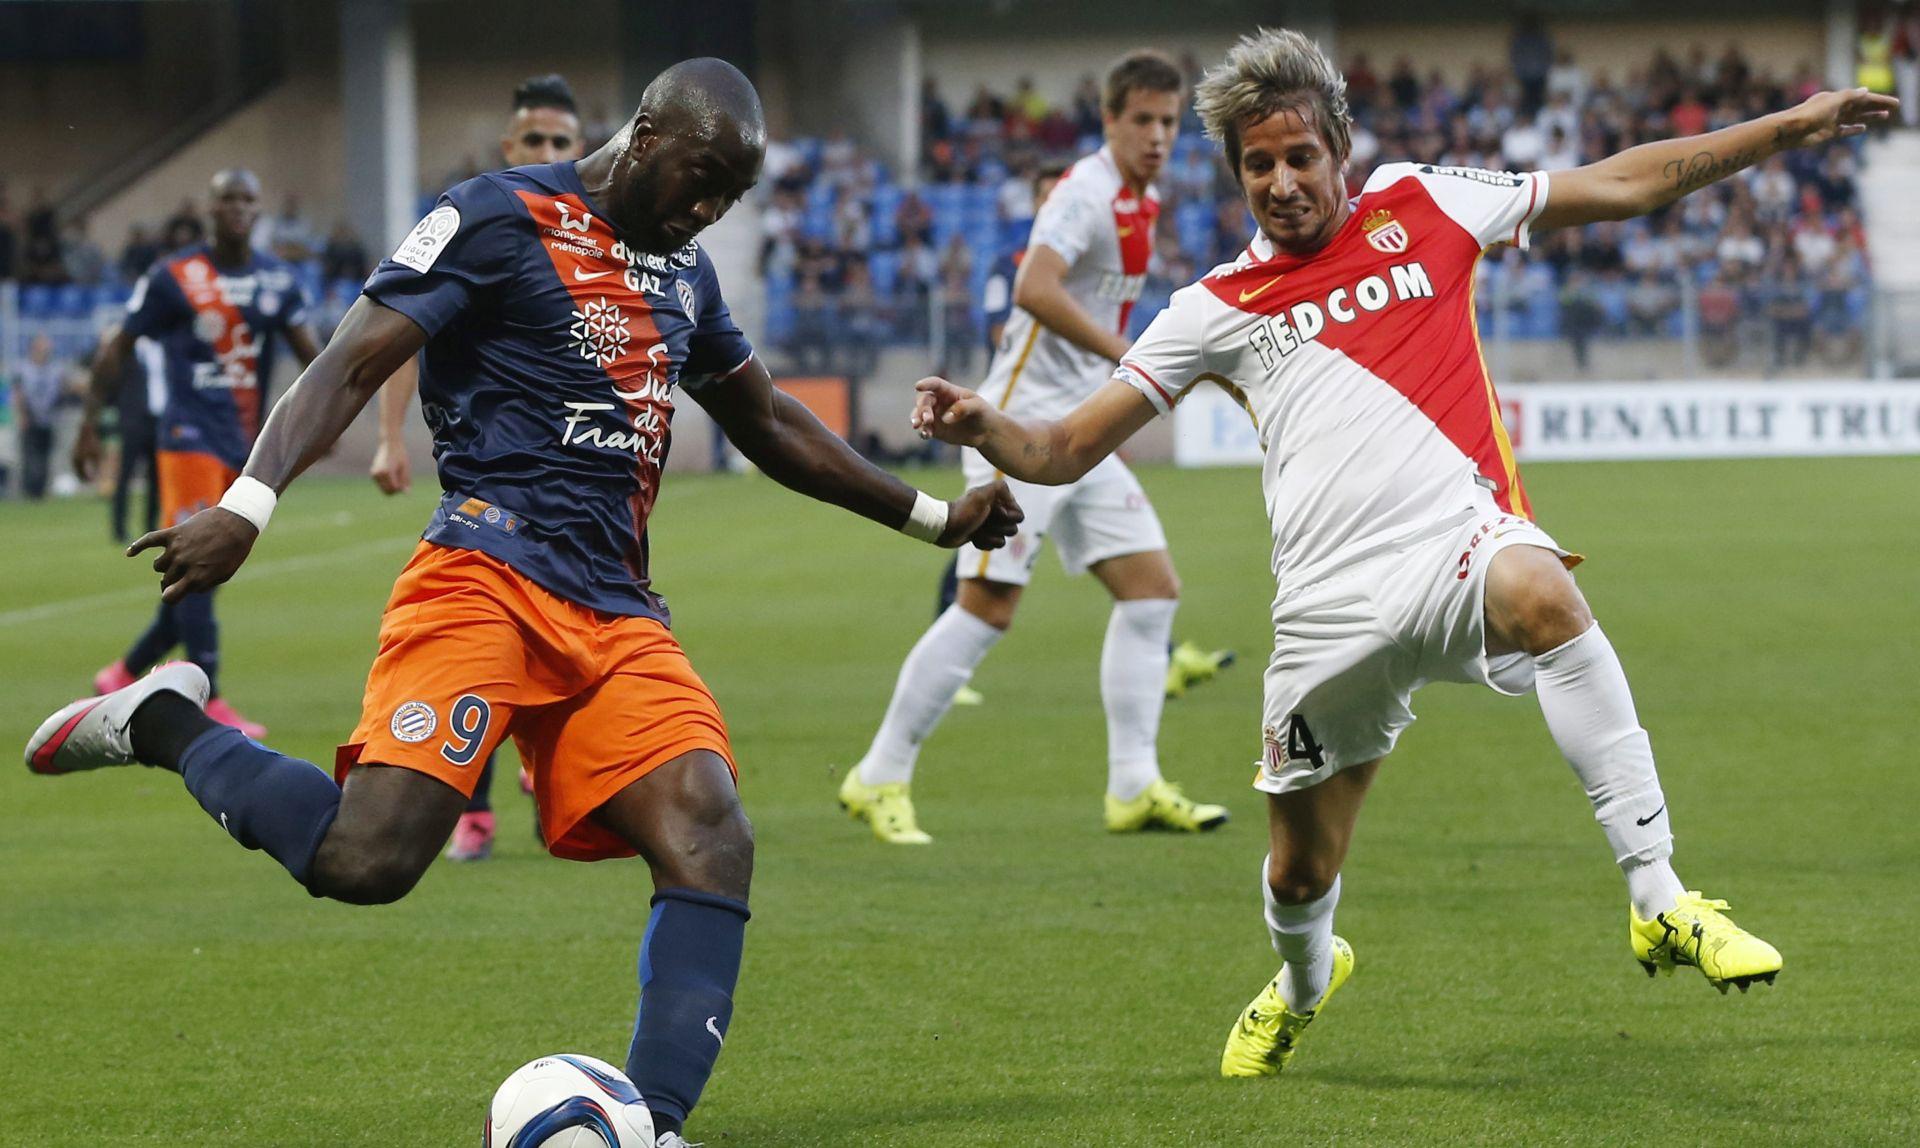 LIGUE 1 Monaco preokrenuo protiv Montpelliera, nastupali Subašić i Pašalić